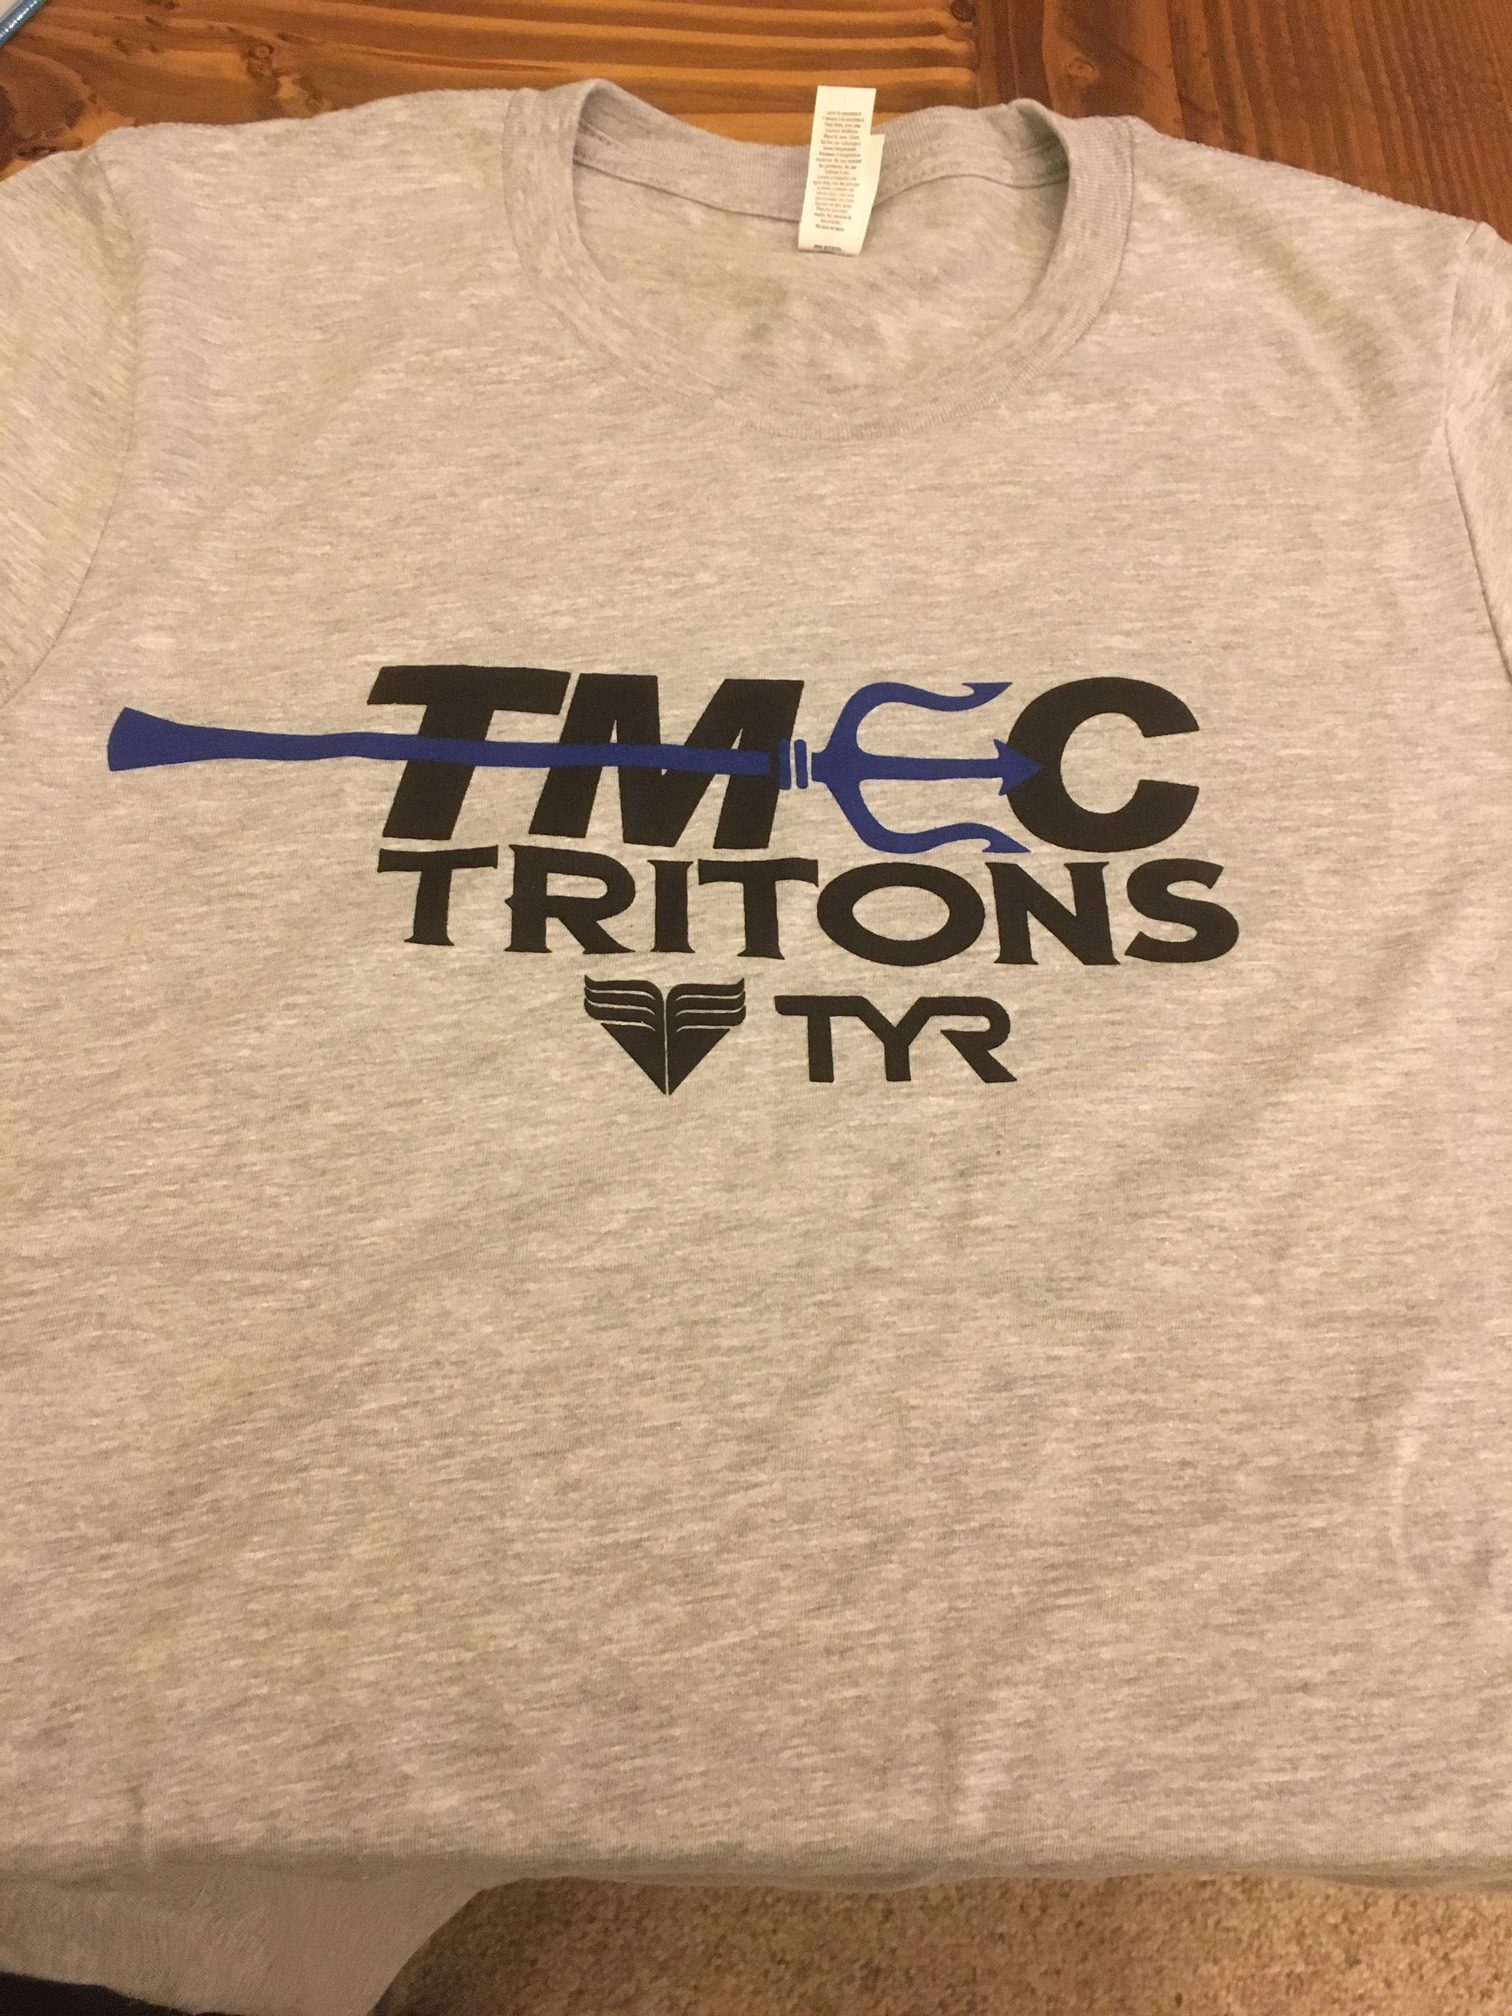 Canvas Men's Cut Grey Short Sleeve T-Shirt